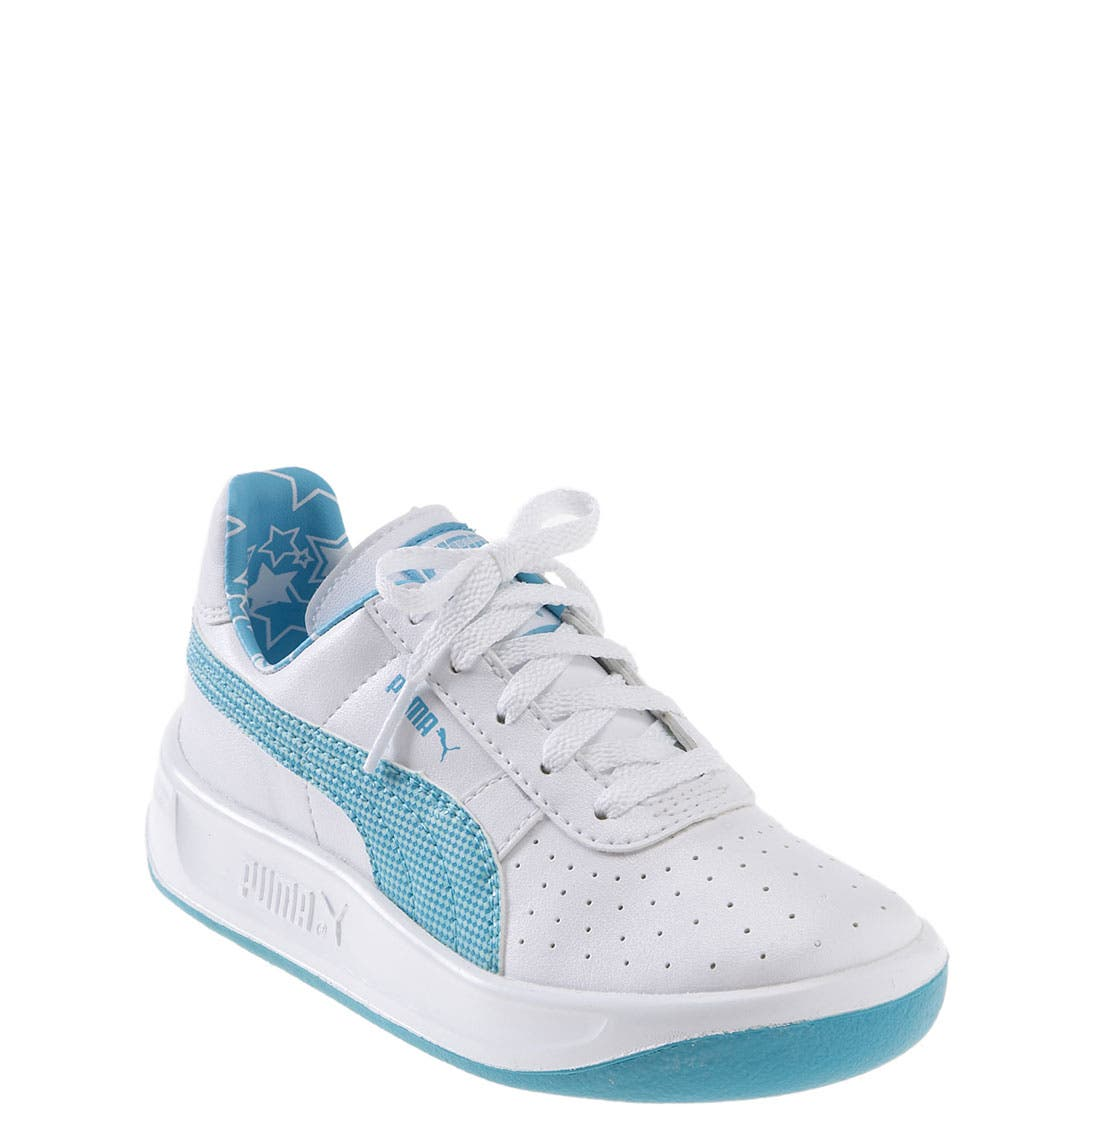 Alternate Image 1 Selected - Puma 'GV Glow' Sneaker (Baby, Walker, Toddler & Little Kid) (Nordstrom Exclusive)